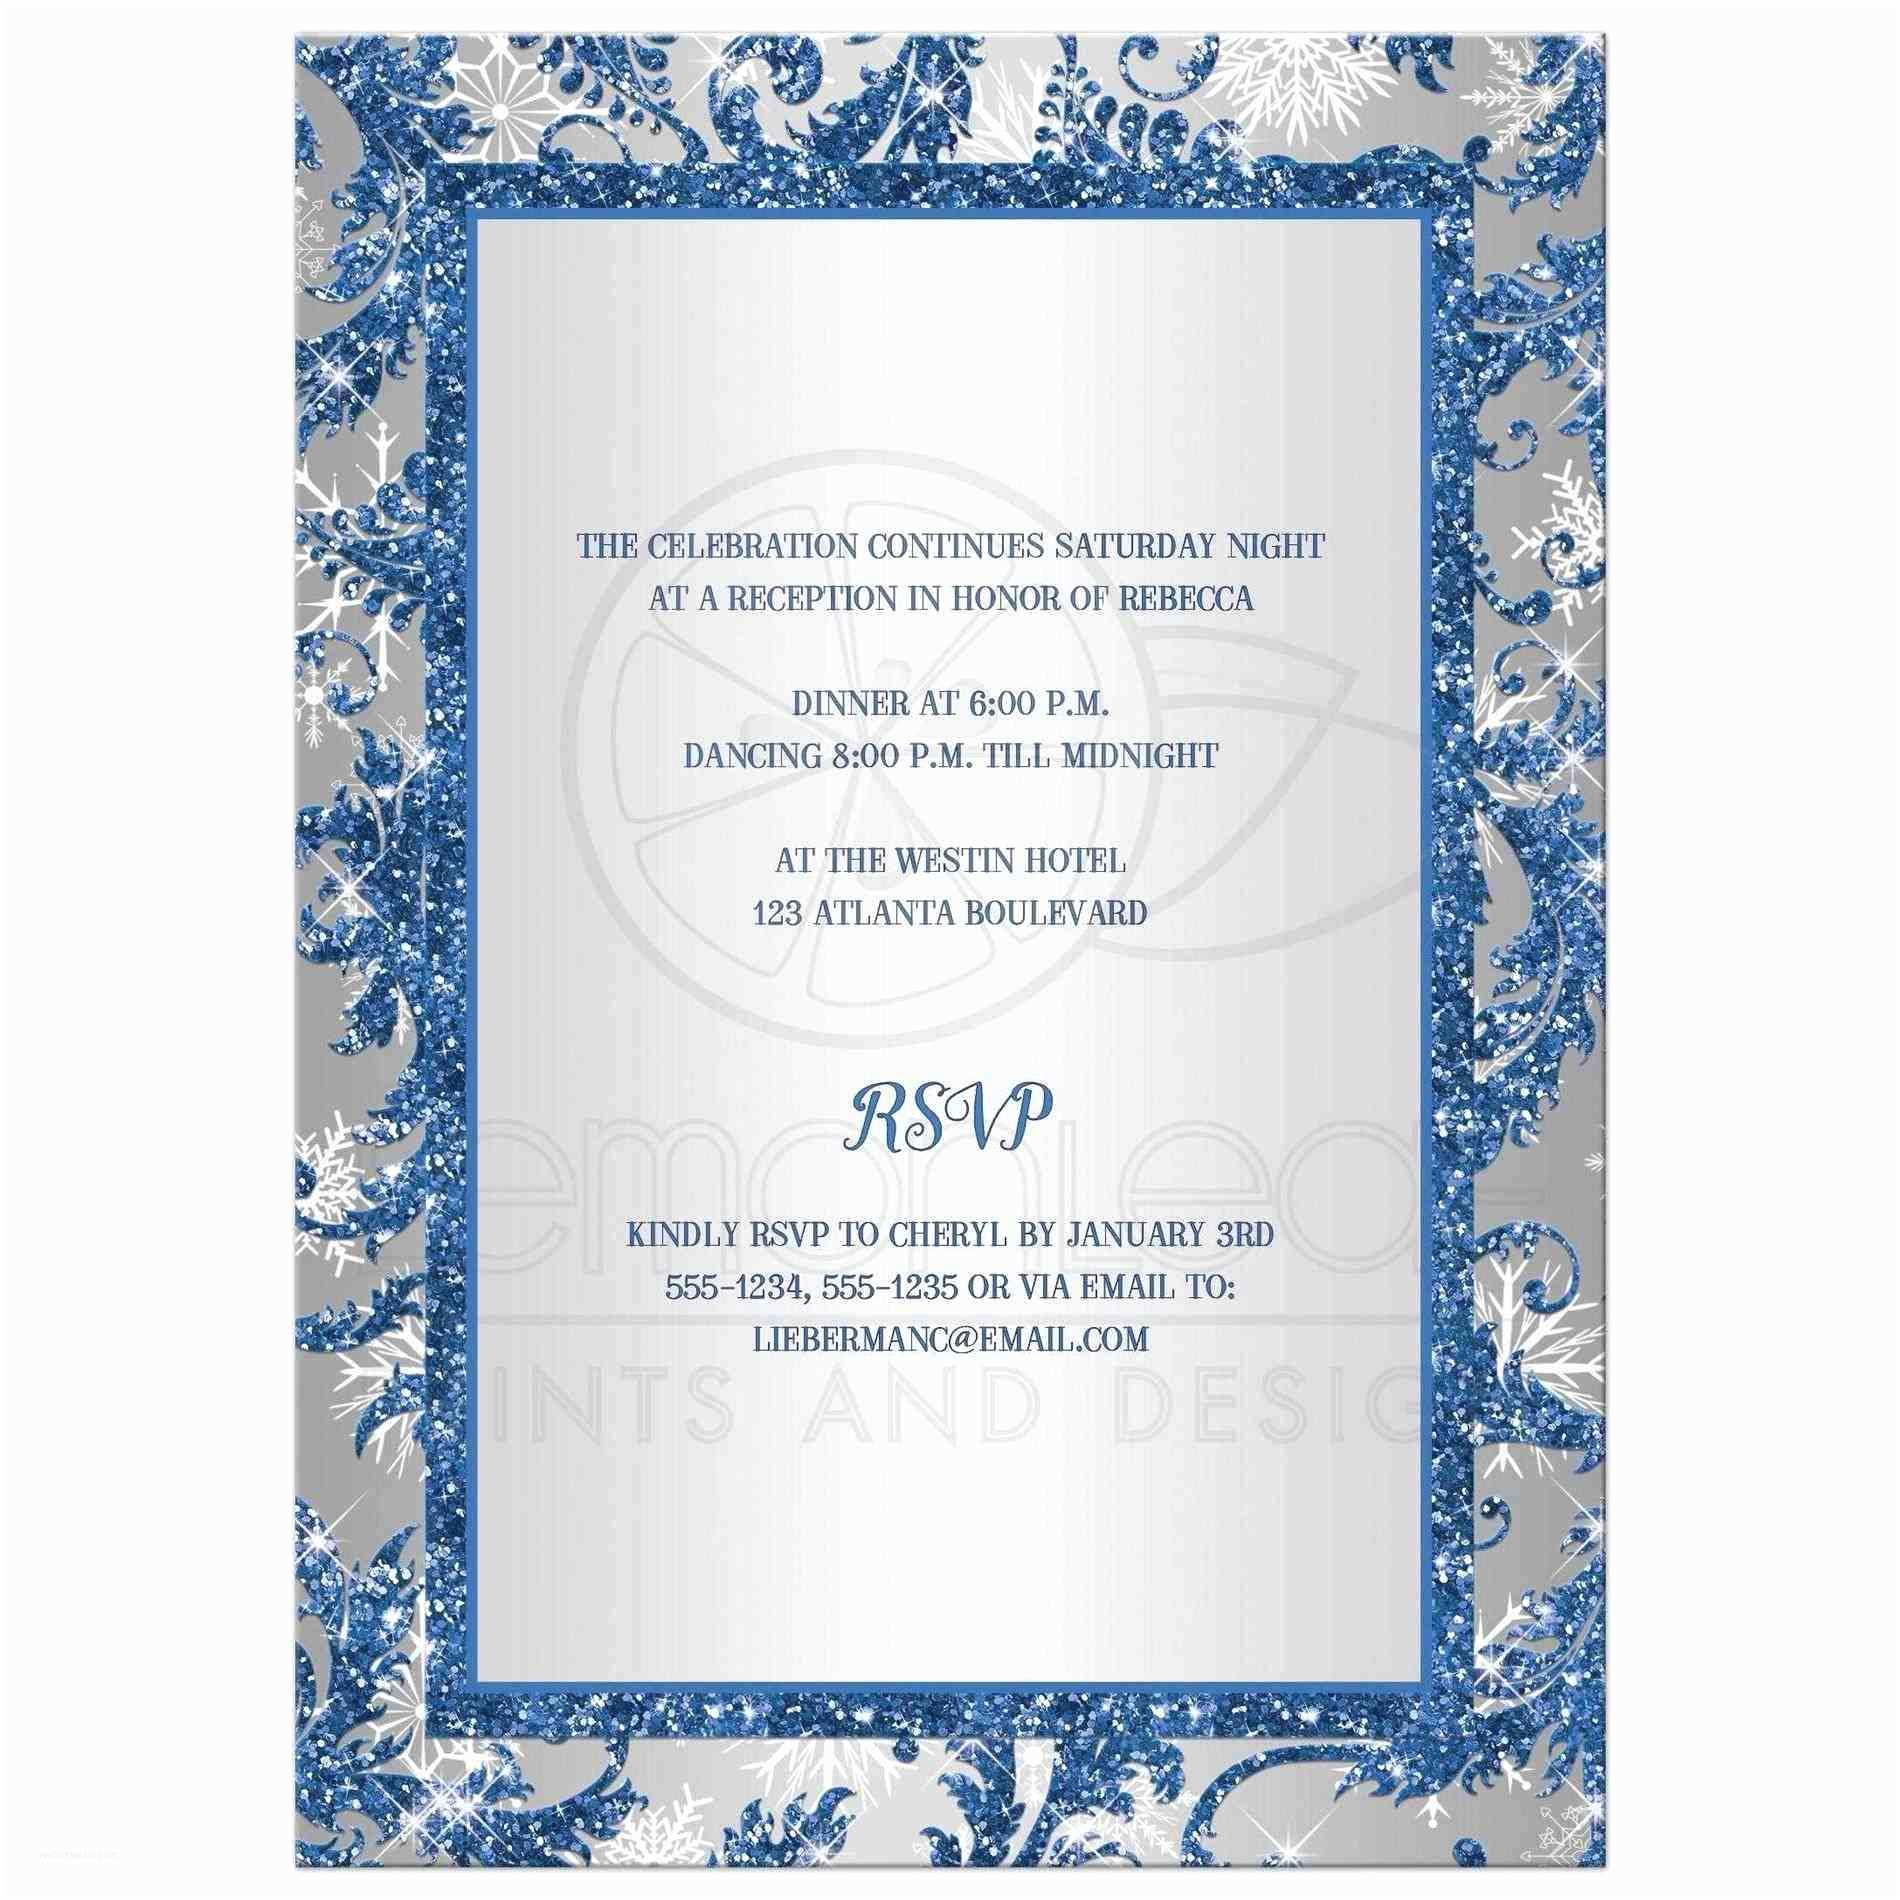 Royal Blue and Black Wedding Invitations Royal Blue and Silver Wedding Invitations Siudy